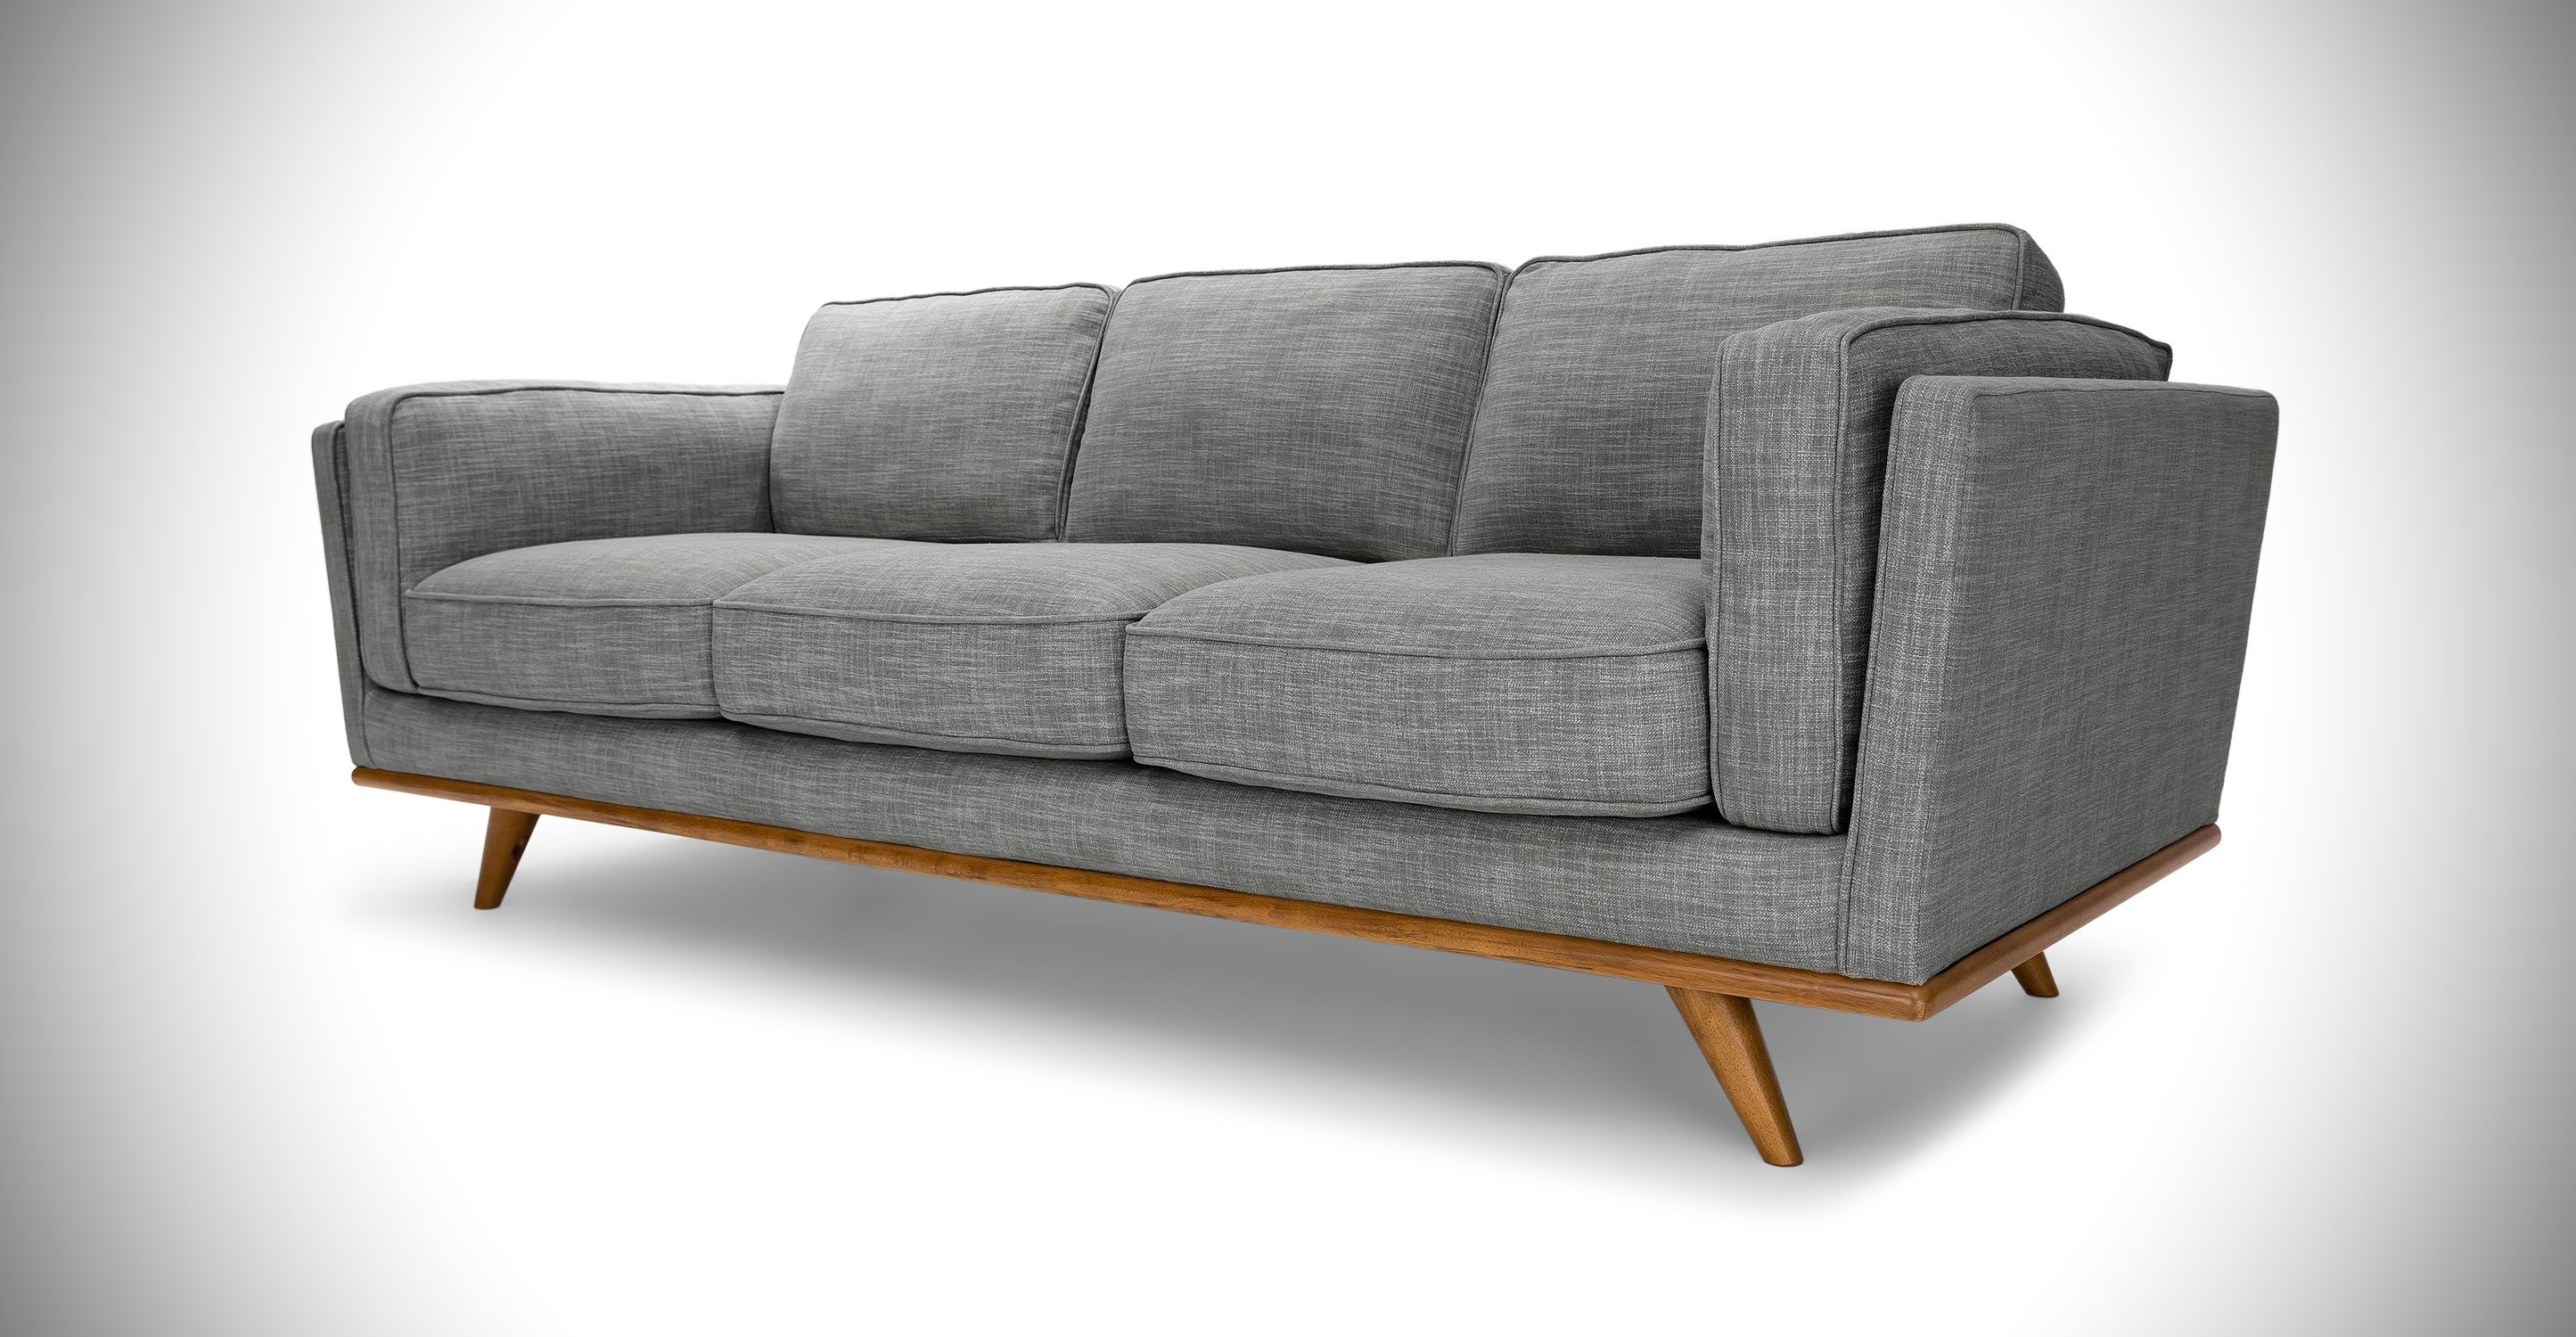 Gray Sofa 3 - Seater In Honey Oak Wood | Article Timber ...